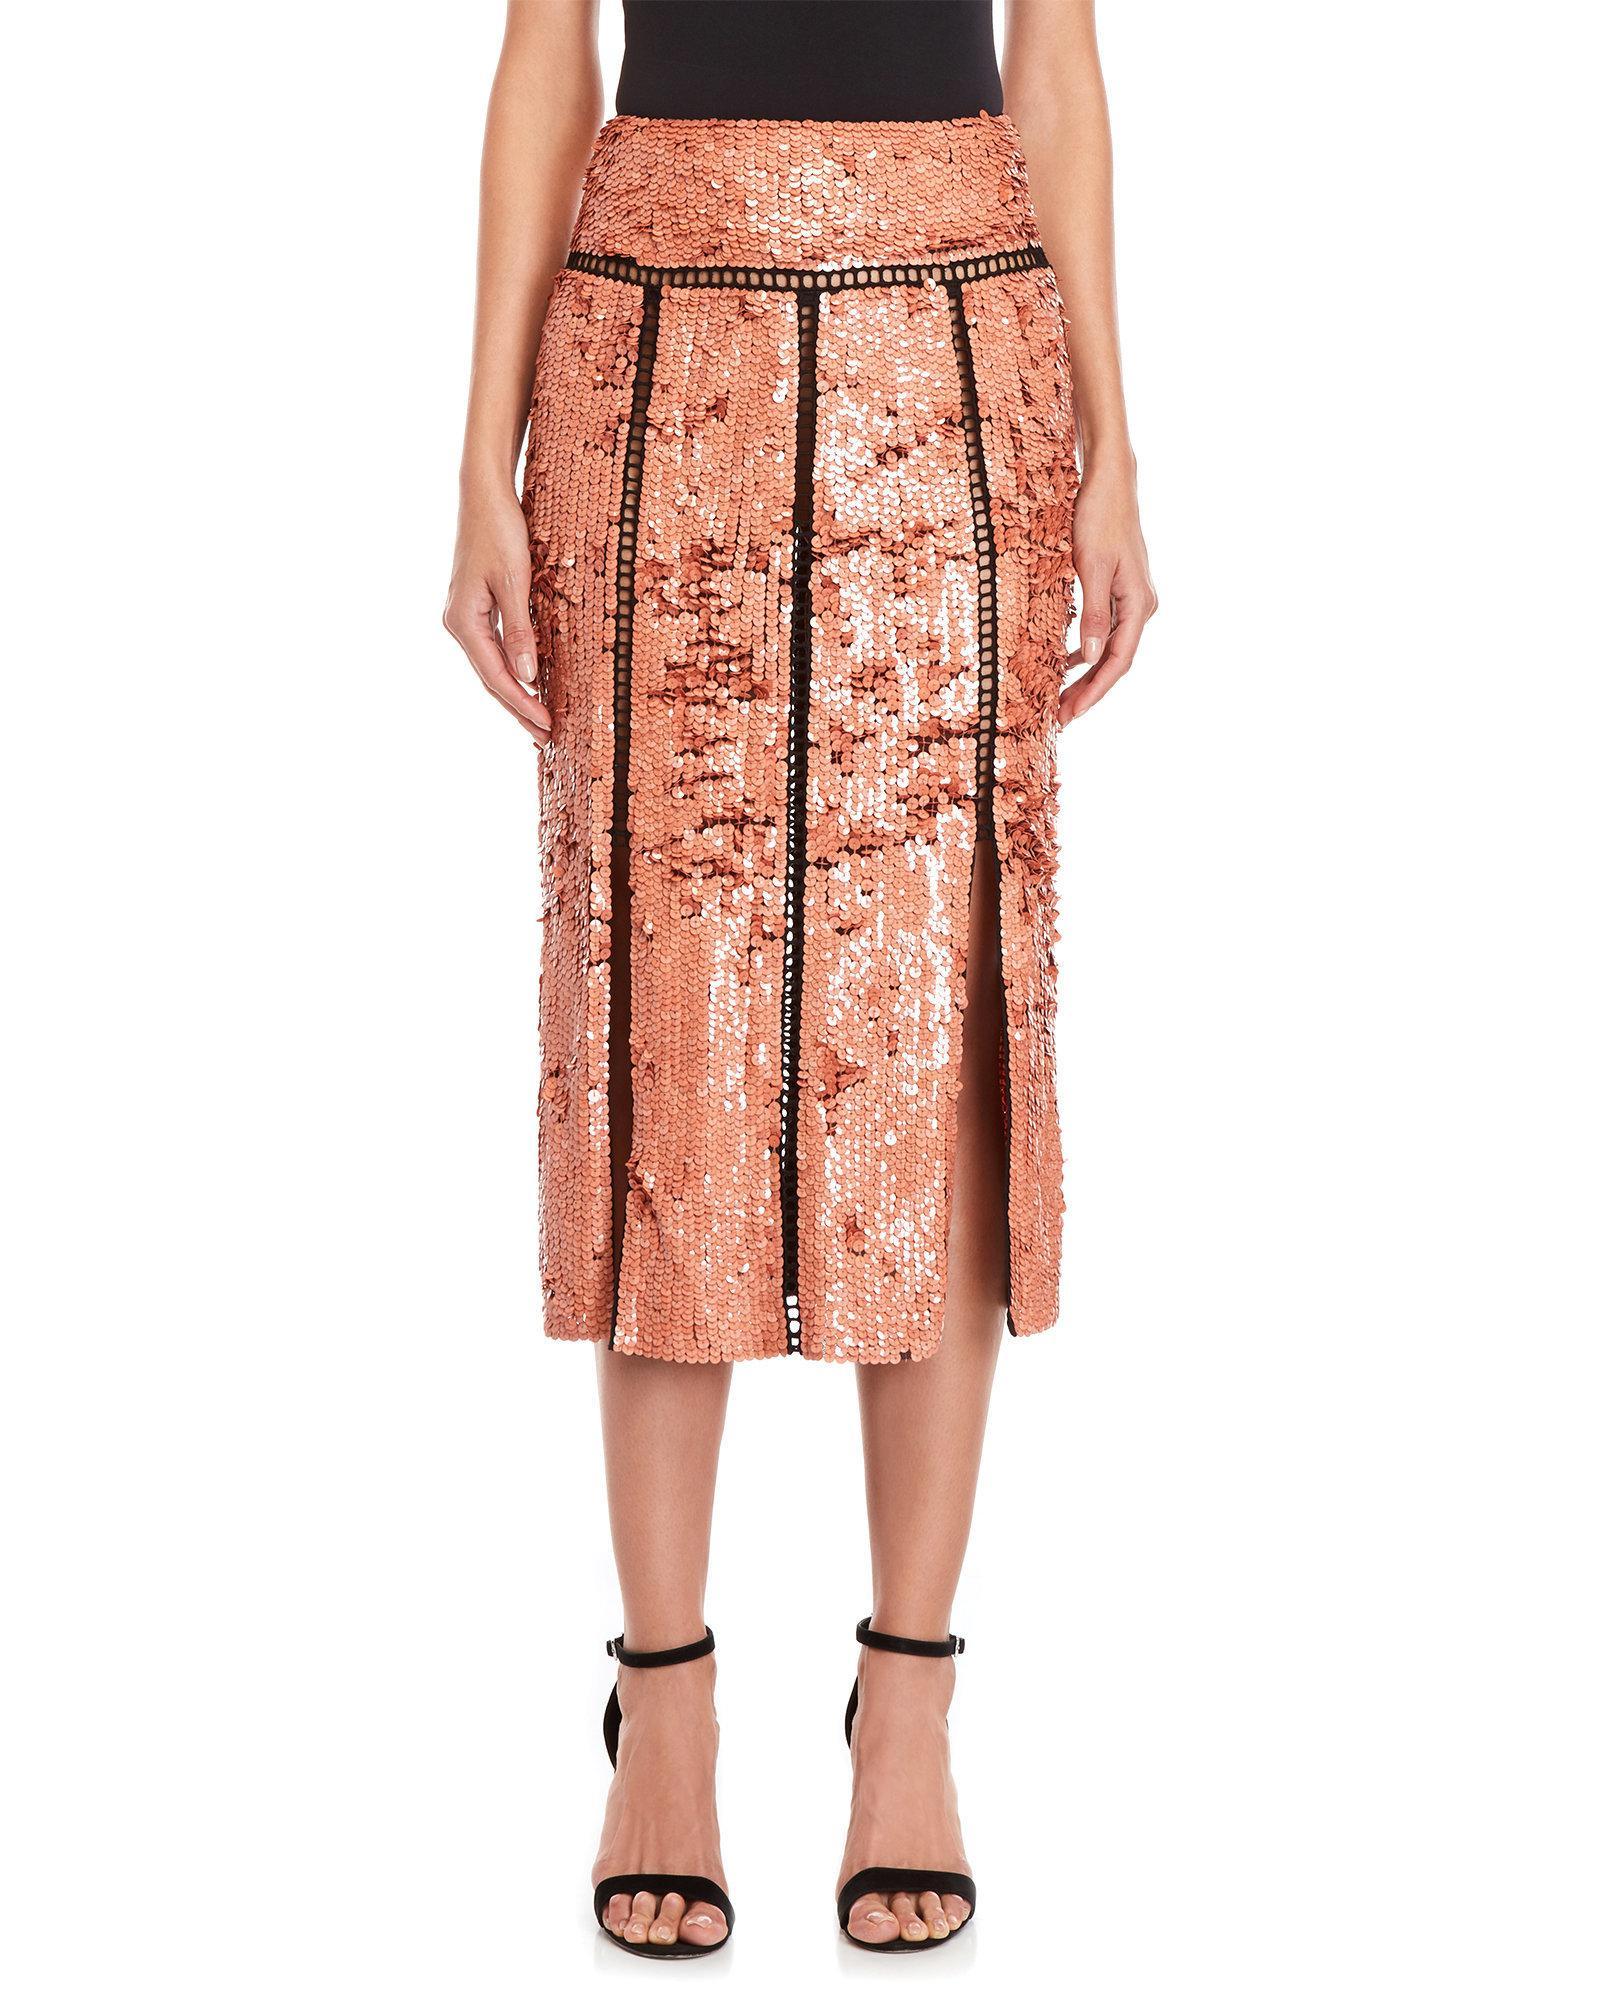 448b4ed7a4 Emilio Pucci Blush Sequin Midi Skirt in Pink - Lyst